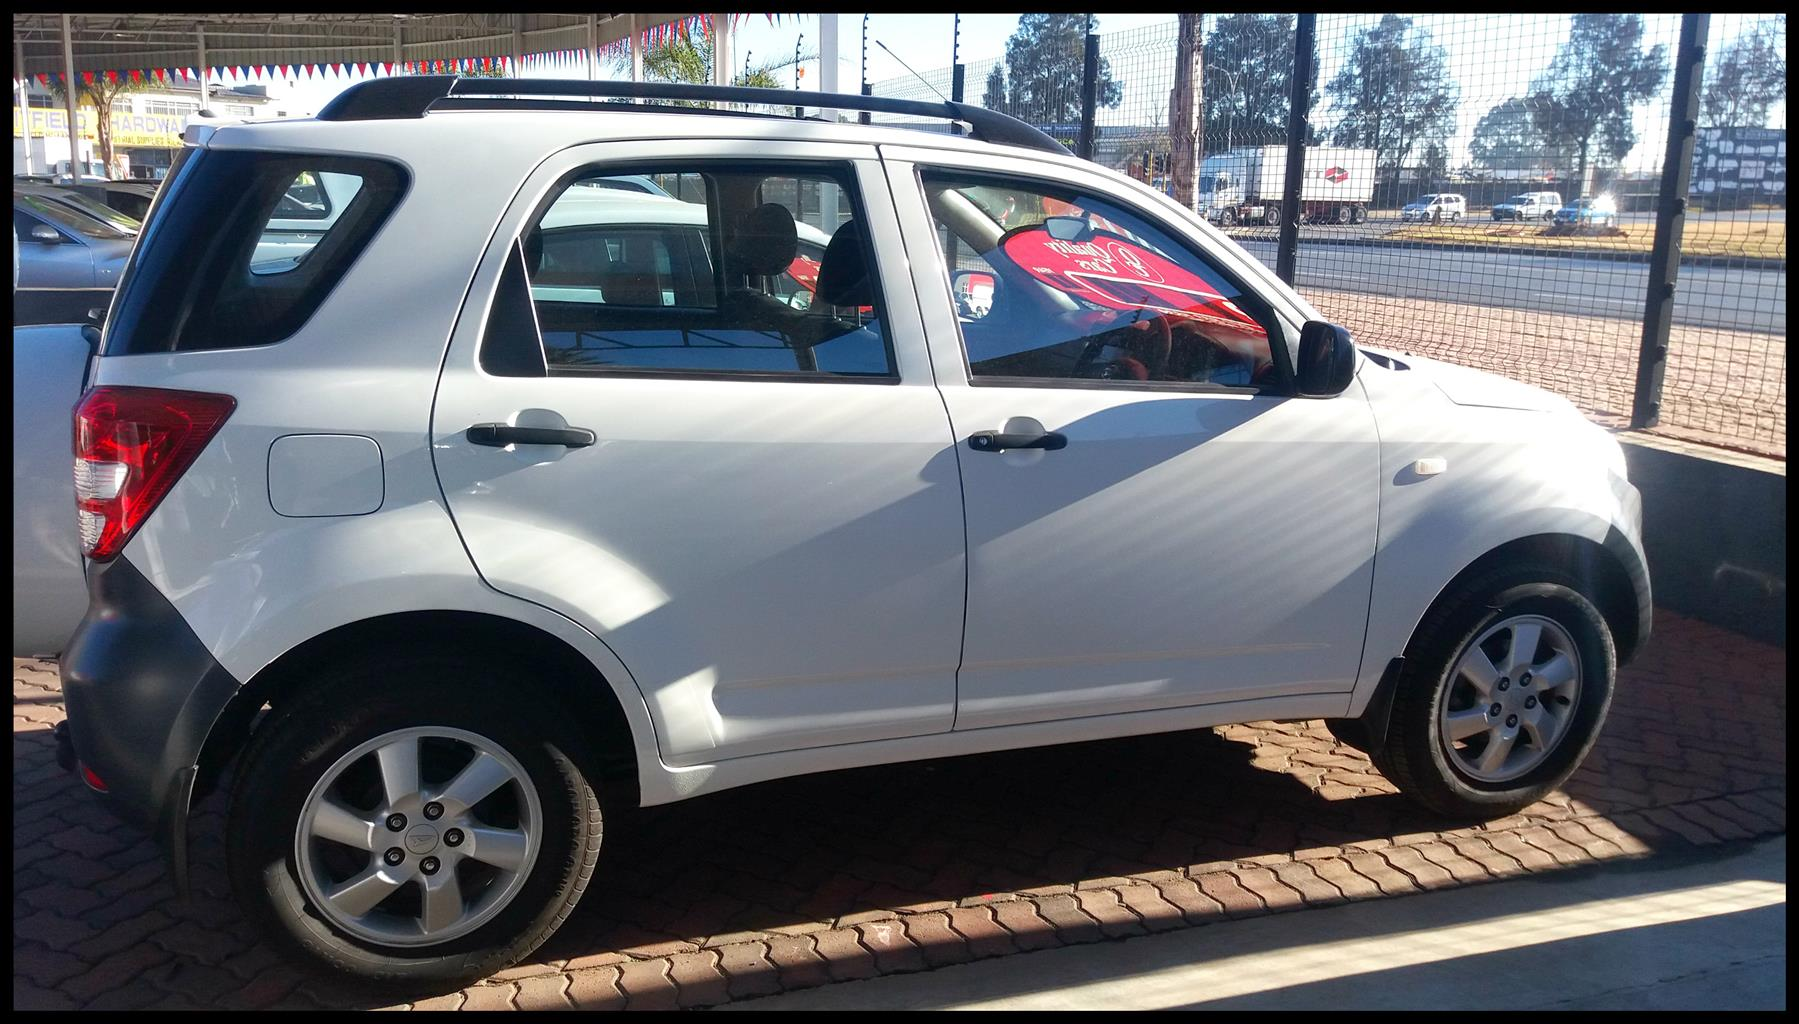 2007 Daihatsu Terios 1.5 4x4